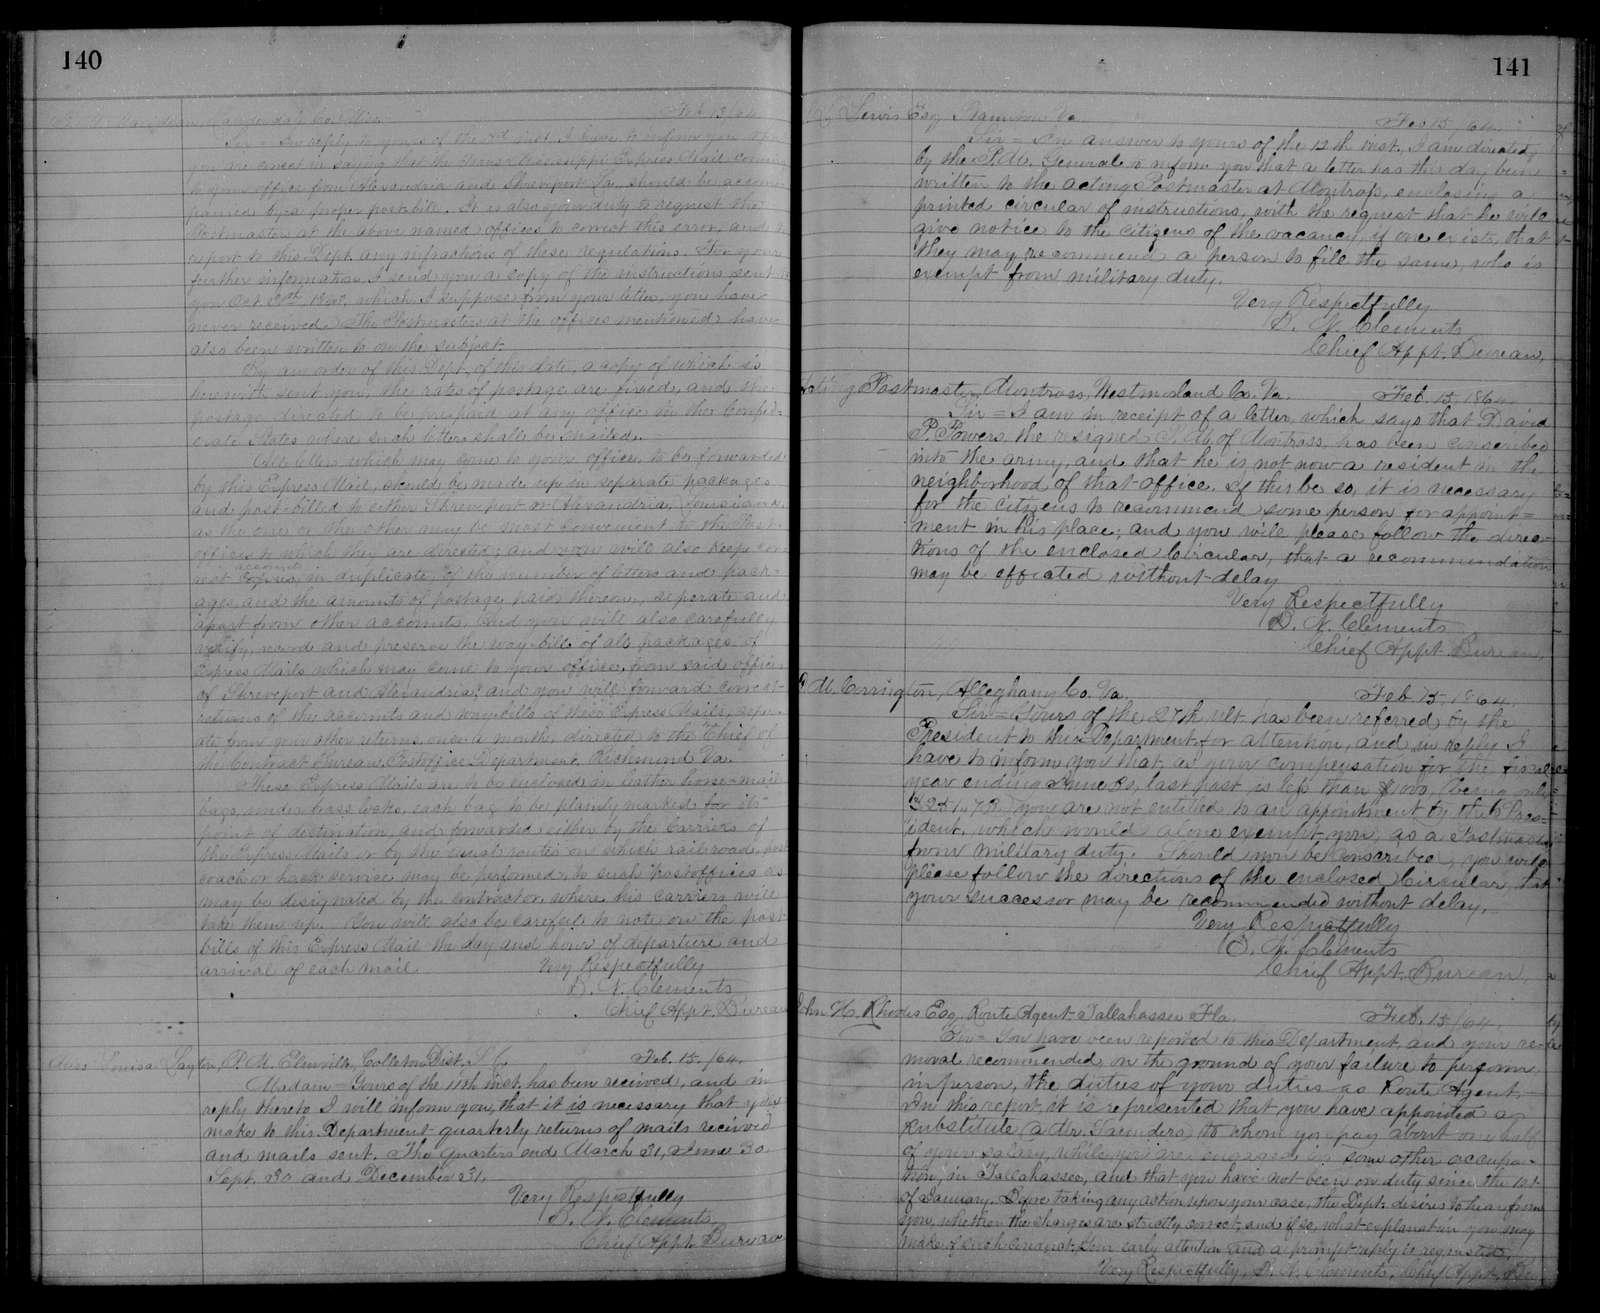 Confederate States of America records: Microfilm Reel 51